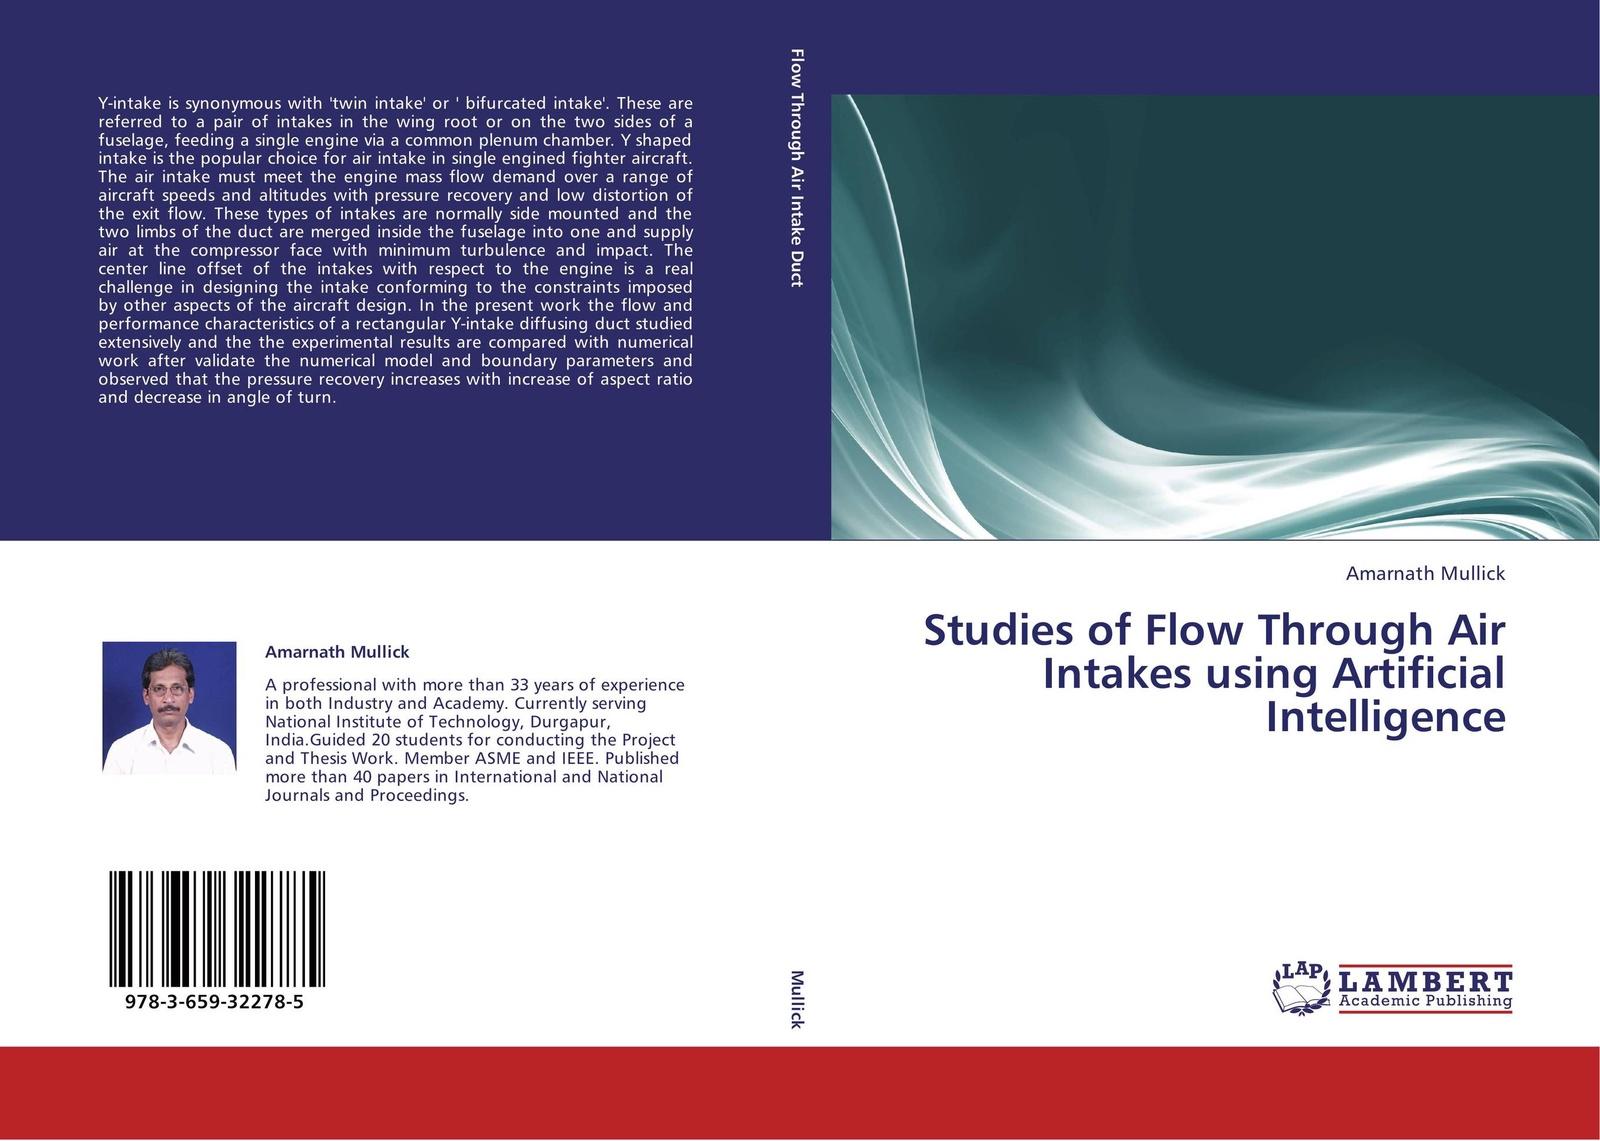 Amarnath Mullick Studies of Flow Through Air Intakes using Artificial Intelligence ручка dnd intake